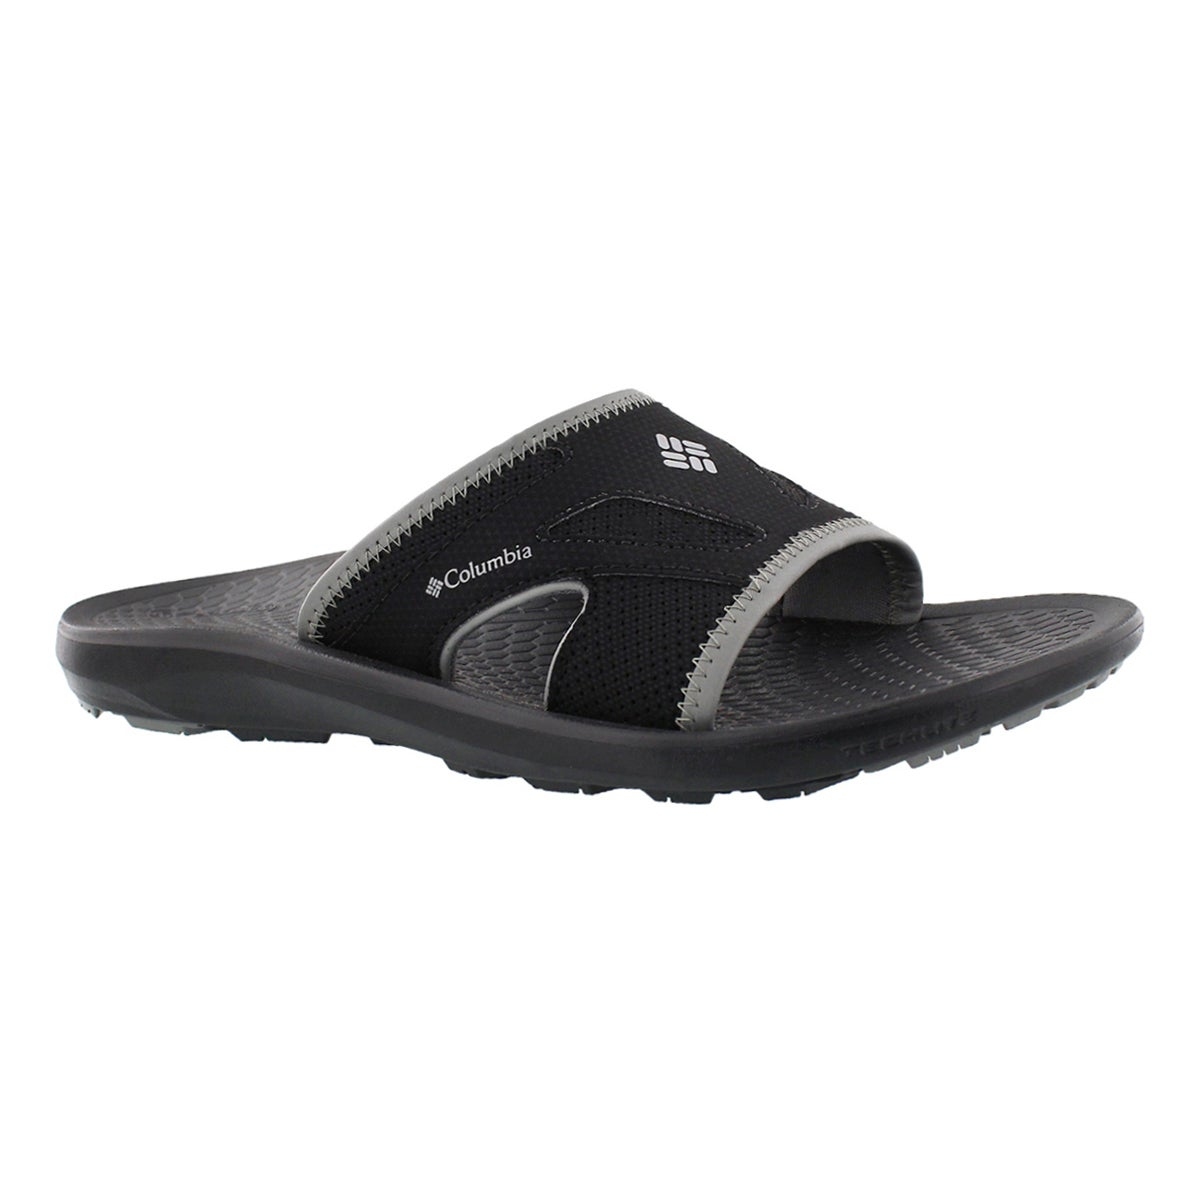 Men's TECHSUN SLIDE  black casual sandals